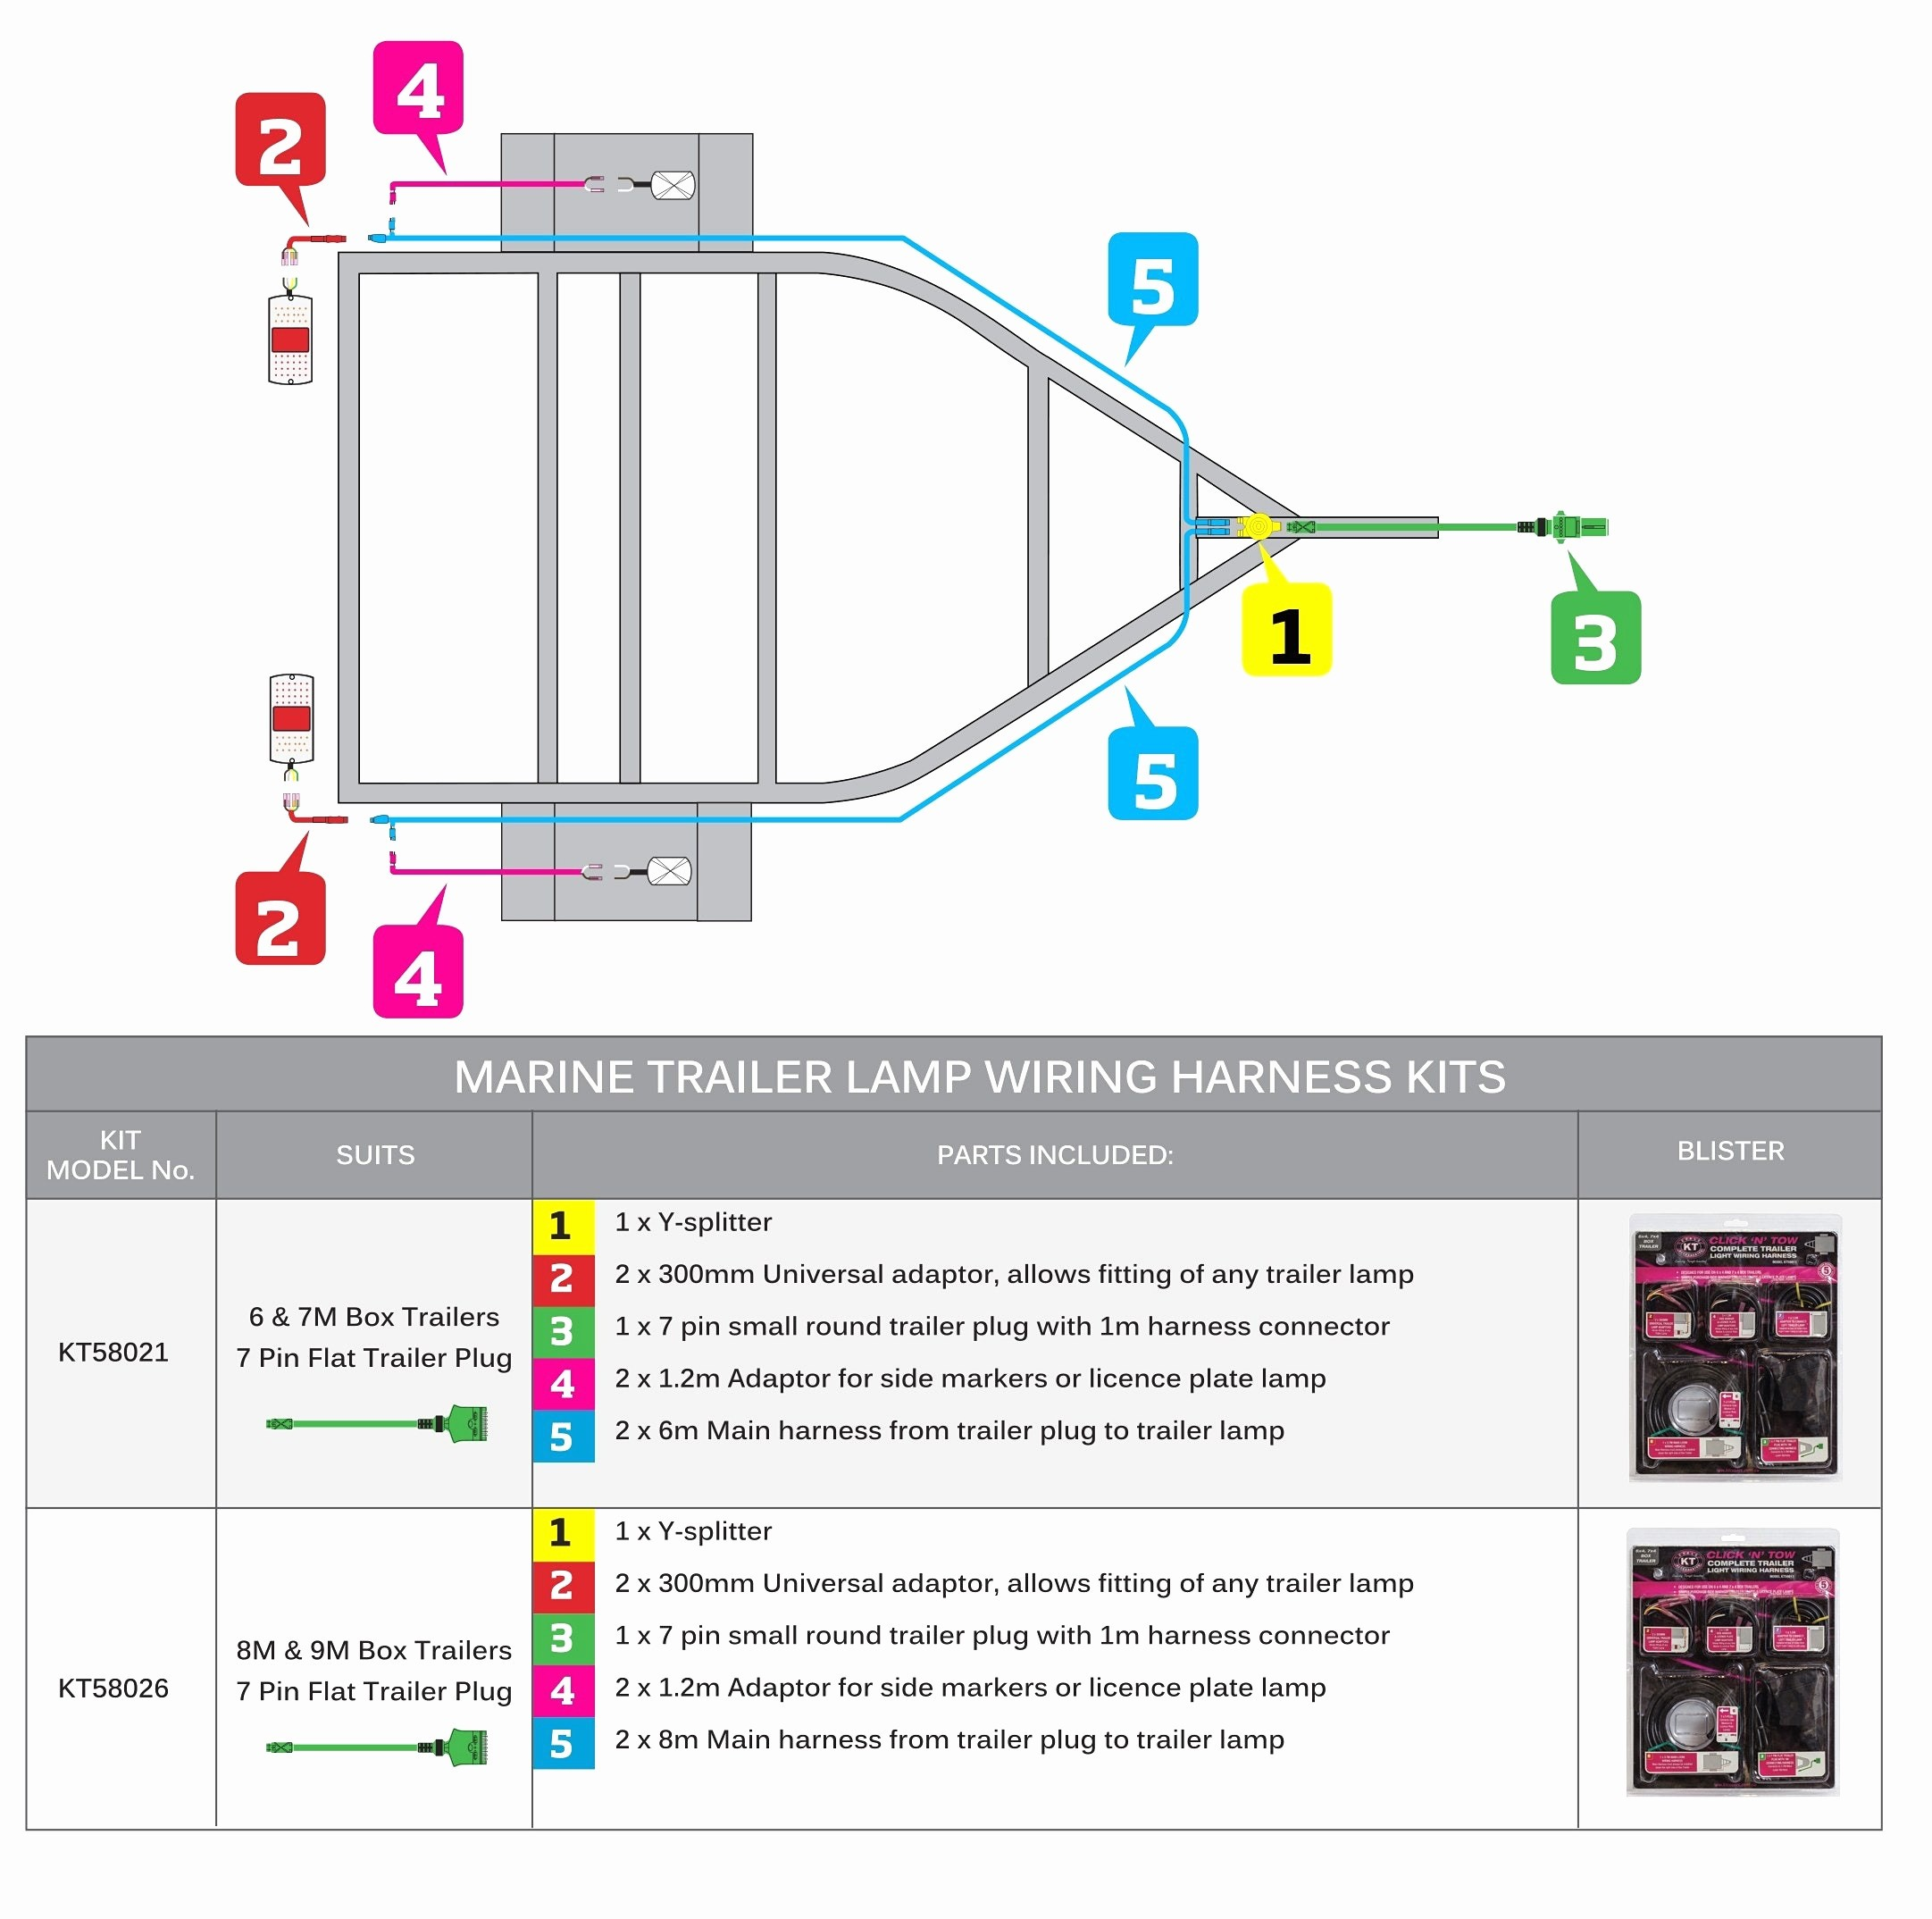 austin healey sprite wiring diagram pj wiring diagram e3 wiring diagram  pj wiring diagram e3 wiring diagram